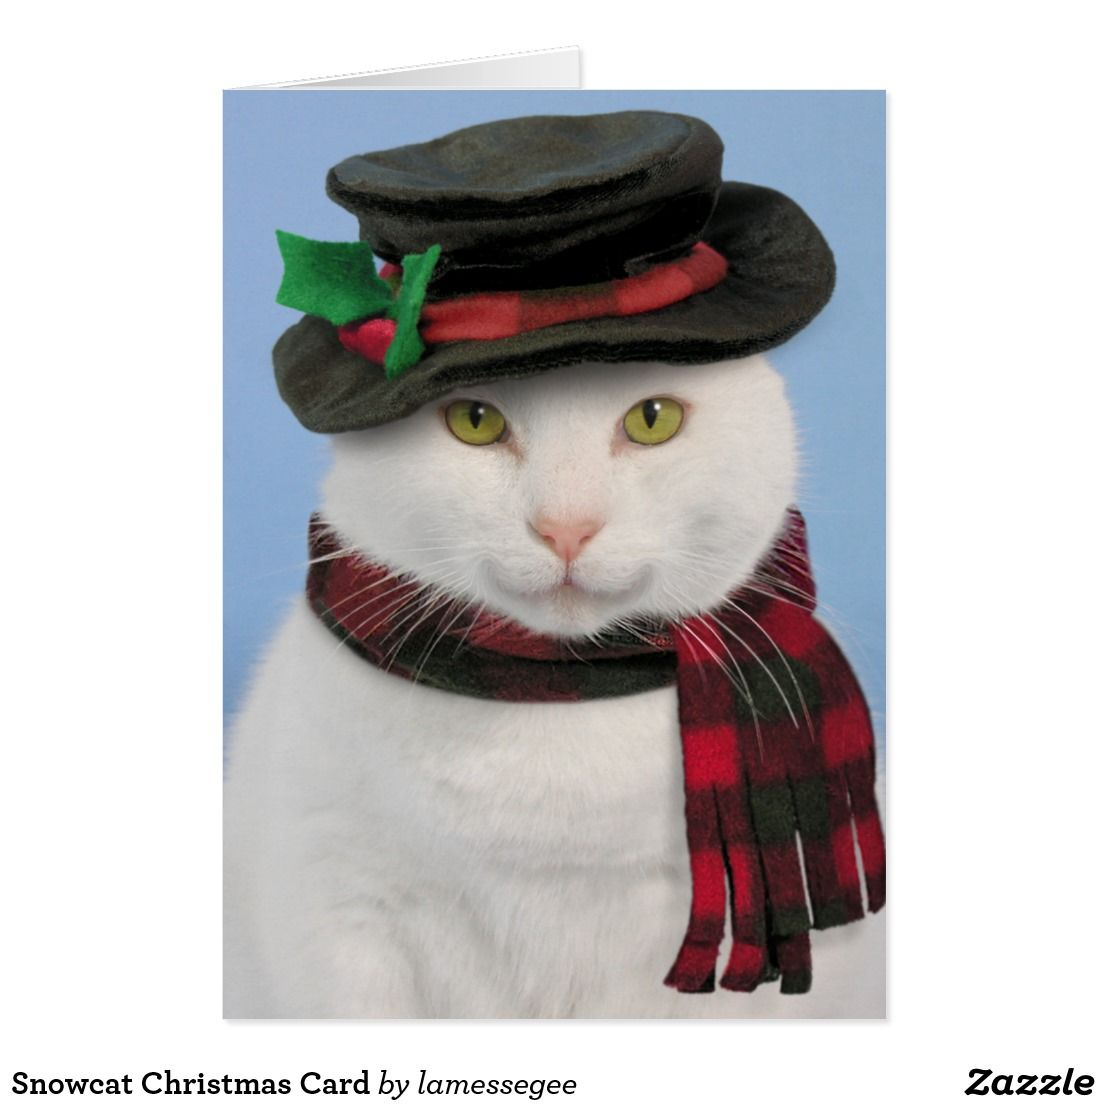 Snowcat cat Christmas Card | Zazzle products I like | Pinterest